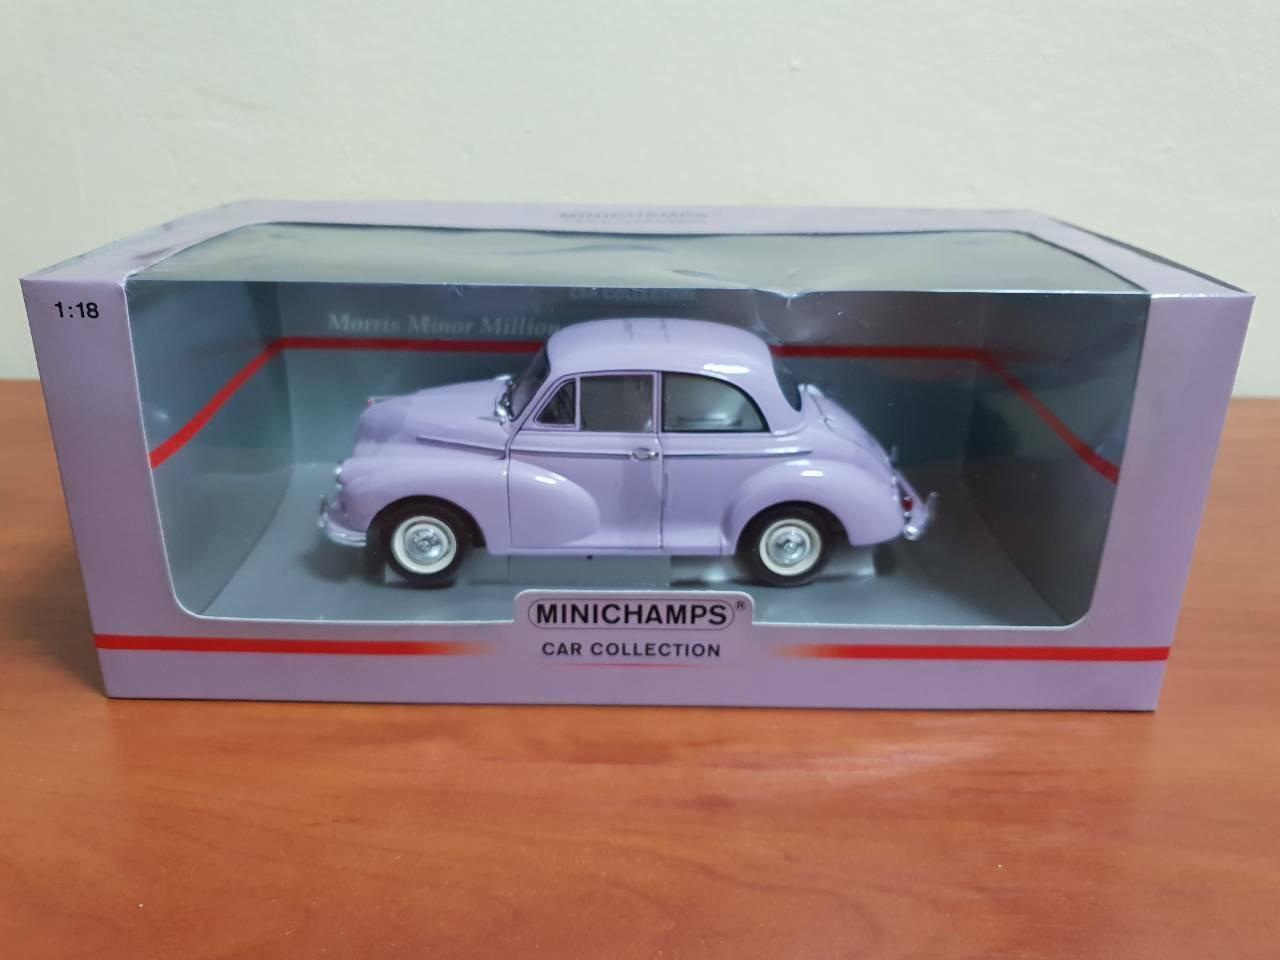 1 18 Minichamps Morris Minor Series III Million 1960 Minichamps   150 137001